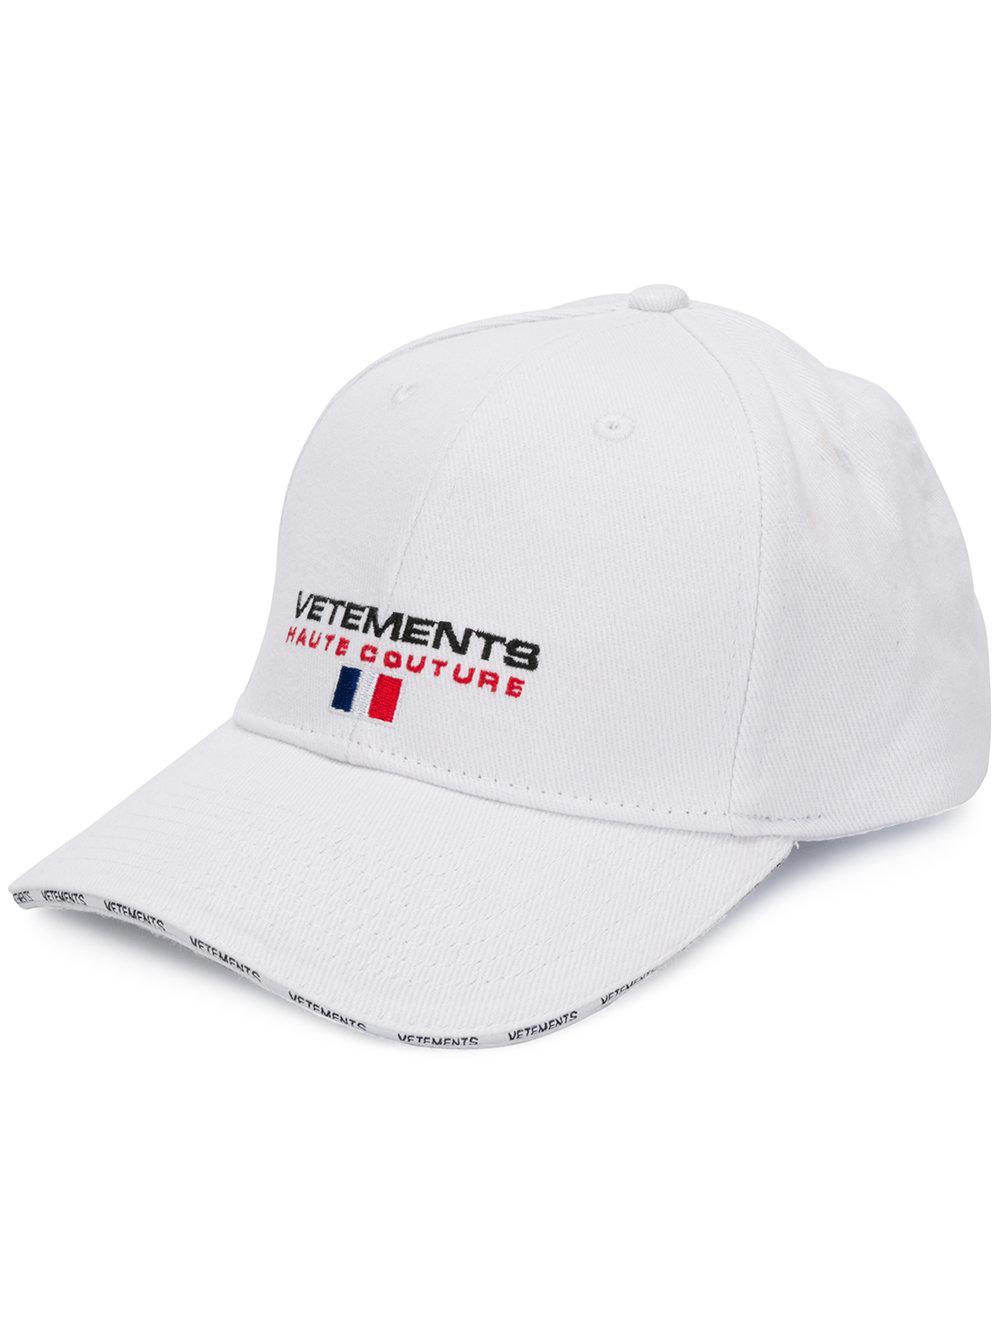 Vetements Logo Cotton Cap in White for Men - Lyst 1d16c9ca2c7b